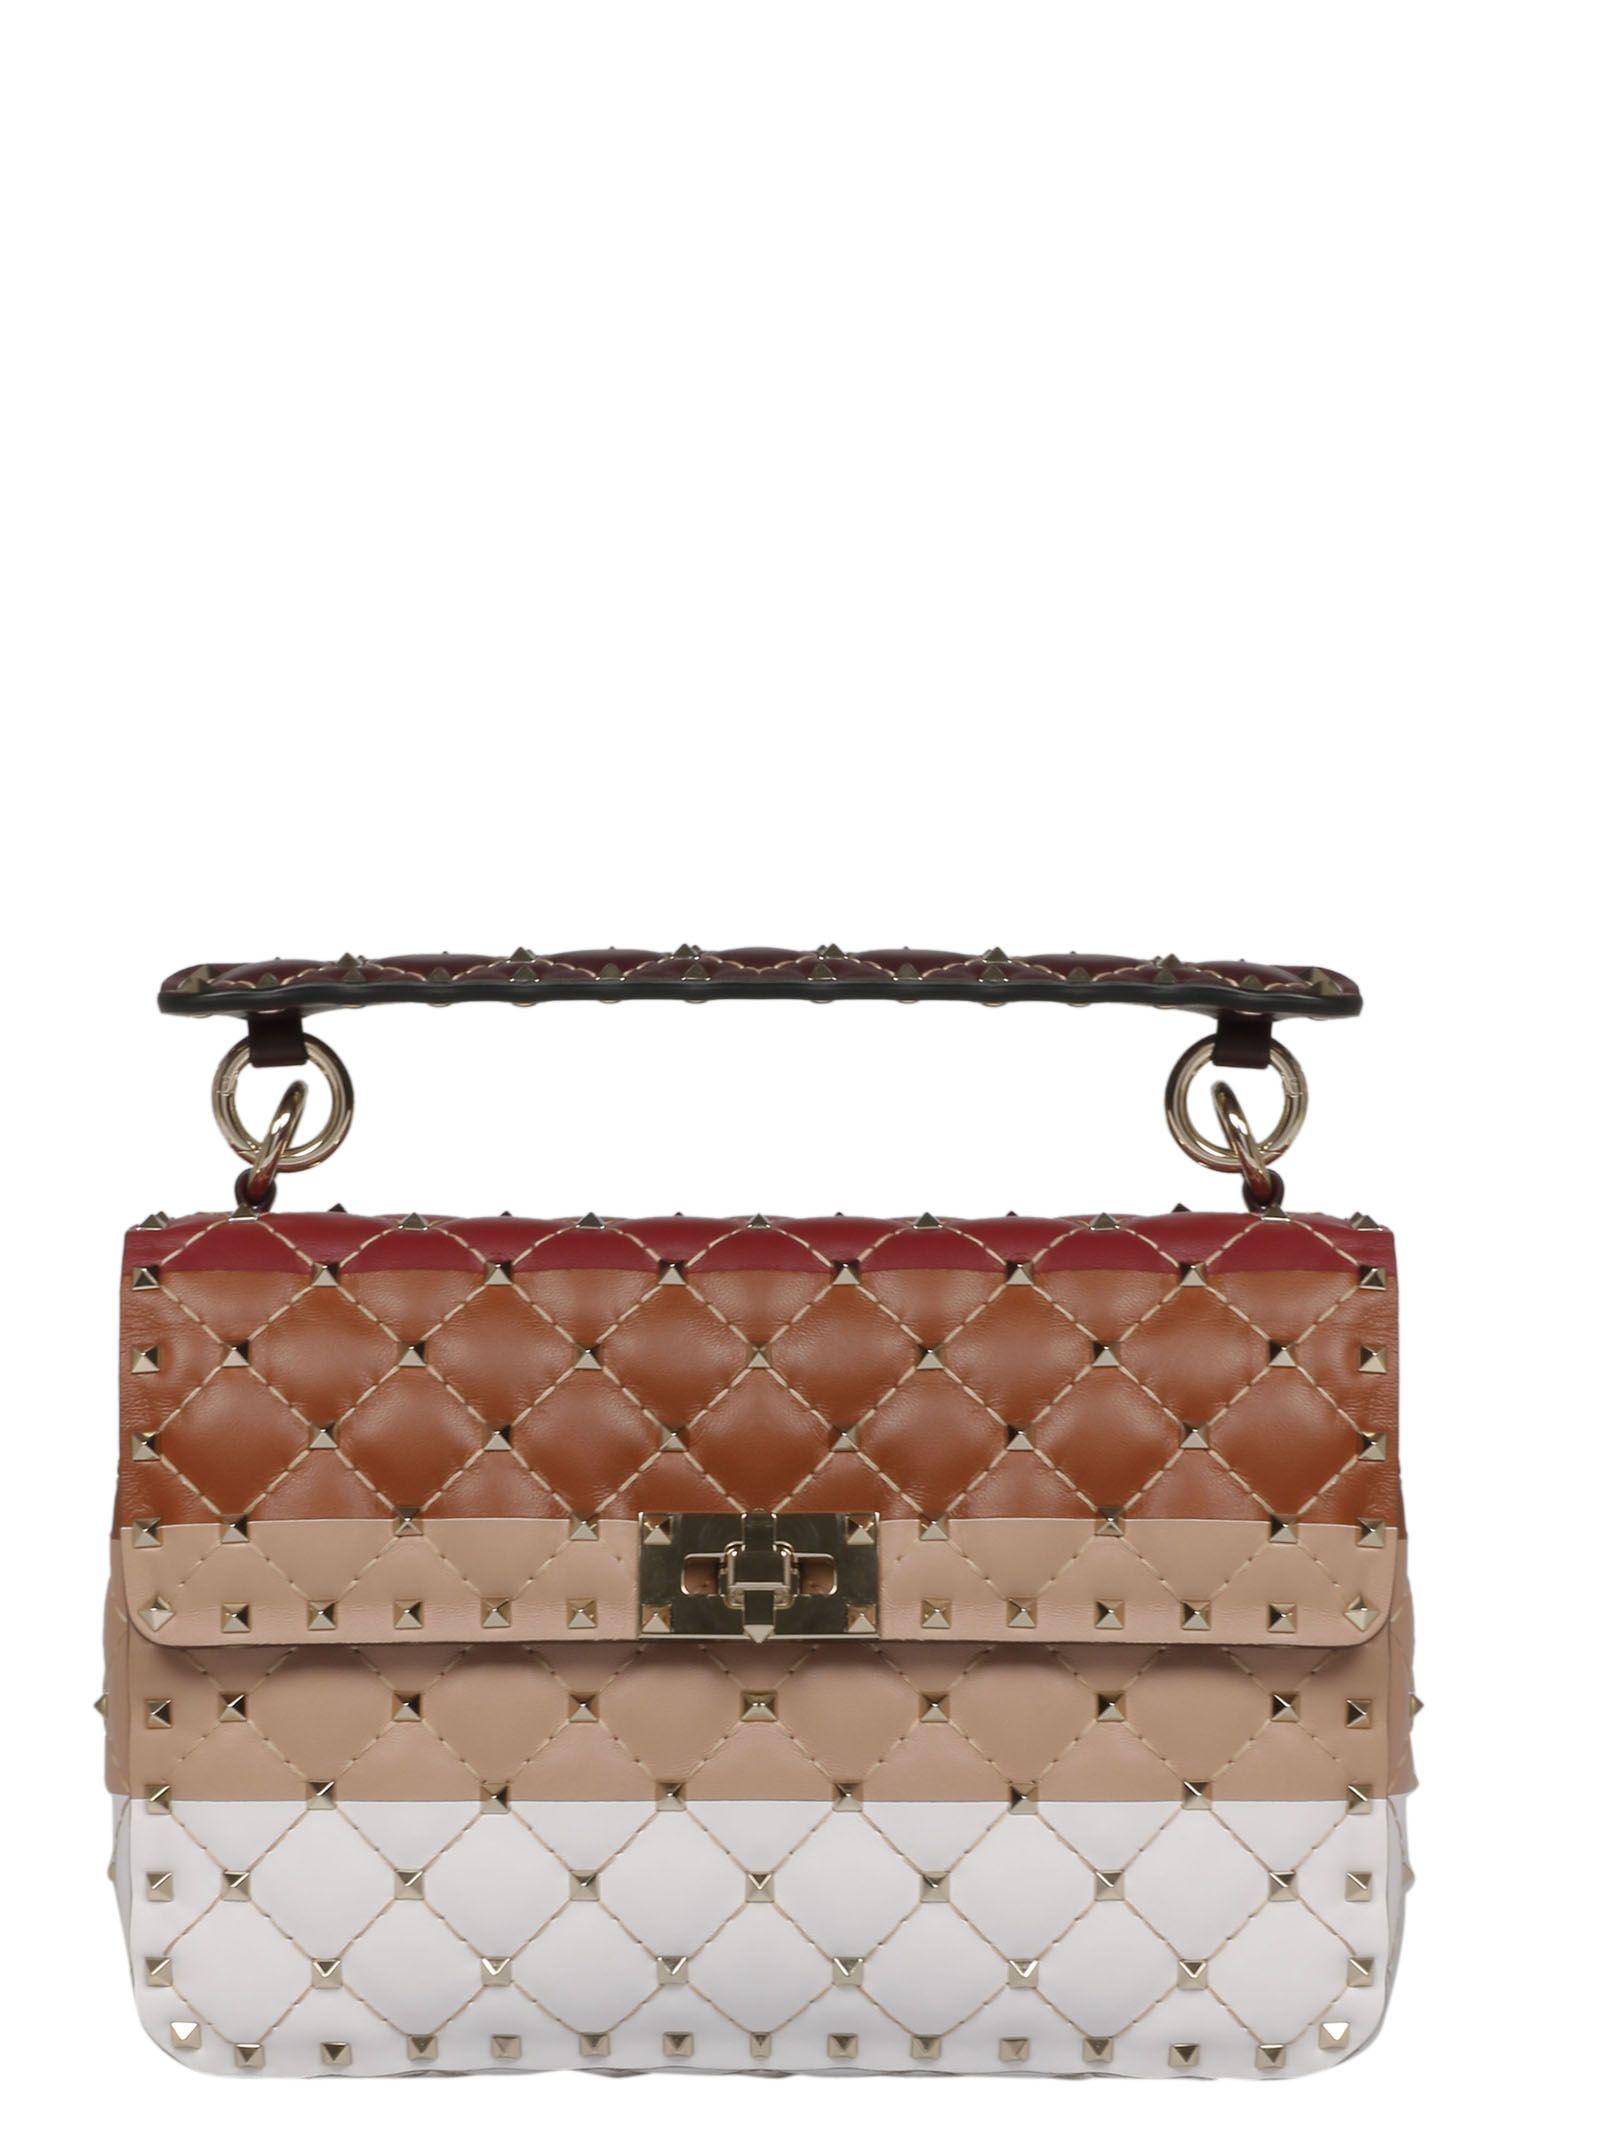 Valentino Garavani Valentino Garavani Rockstud Spike Shoulder Bag ...